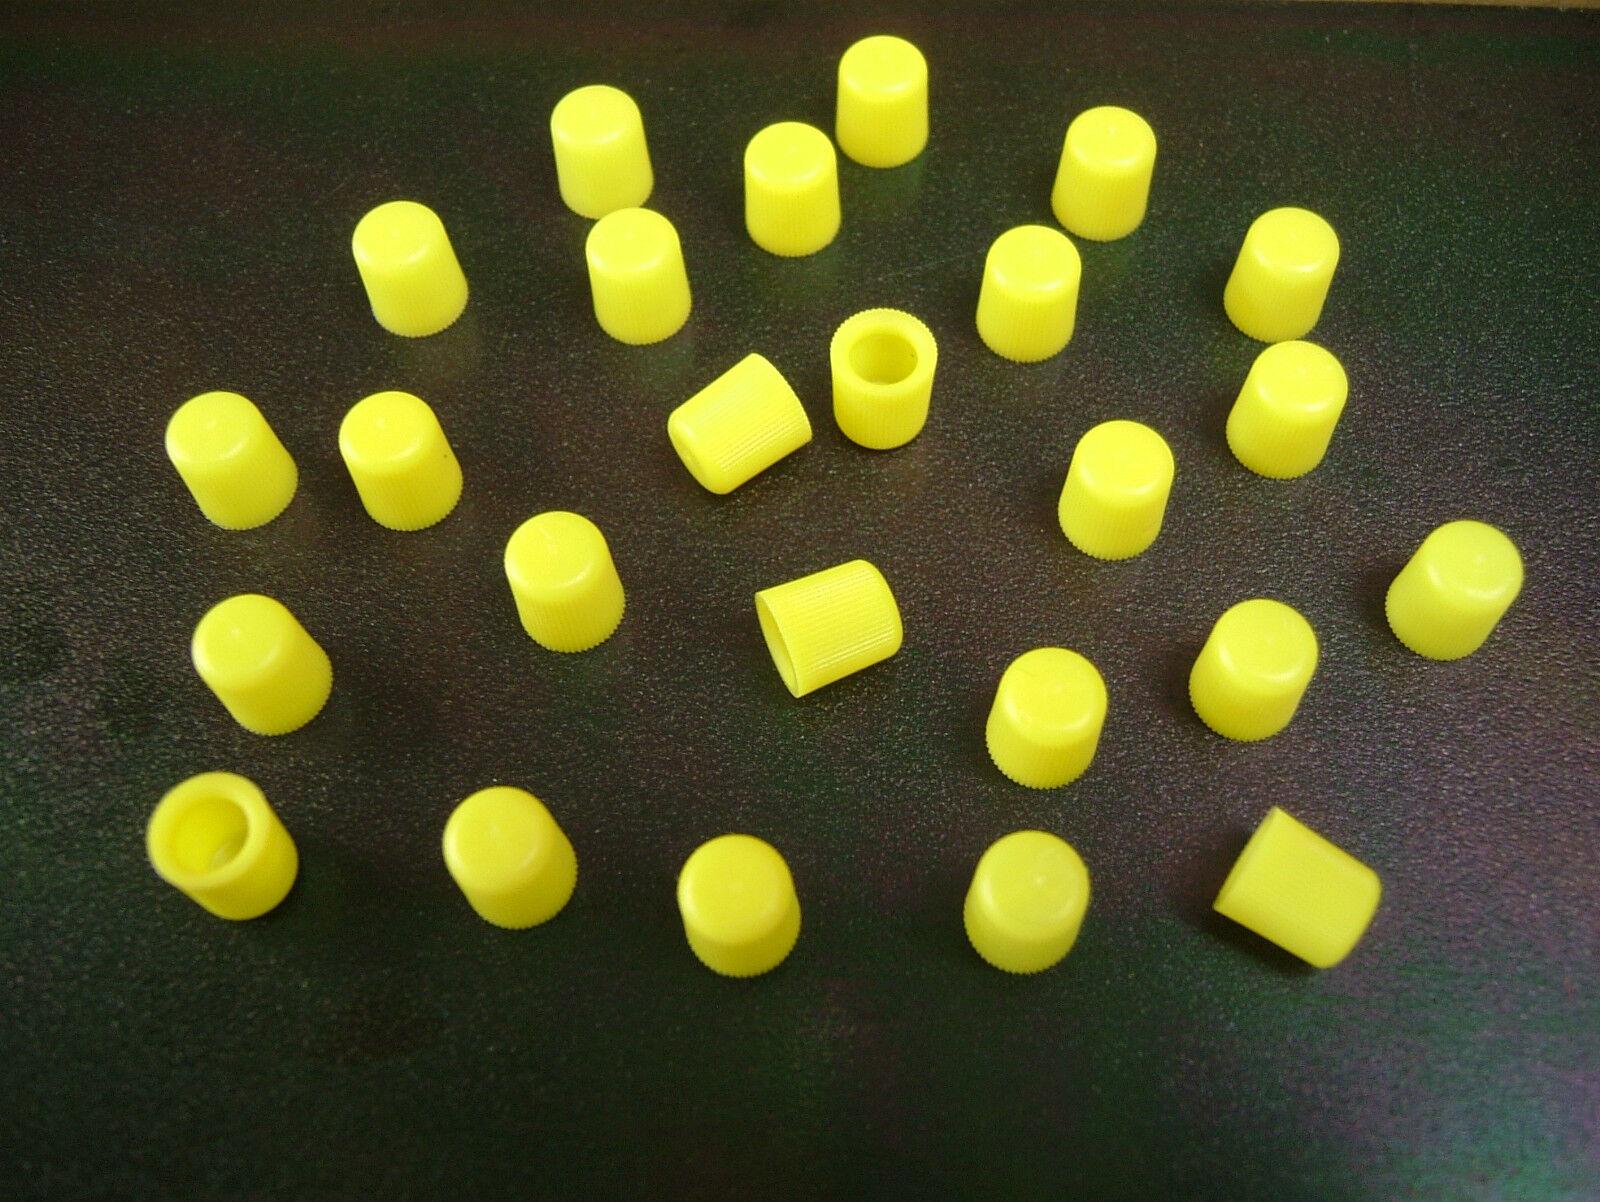 Grease Nipple Cap - Hi-Viz Yellow - Compact 'Snap-On' type - Discount Pack of 25